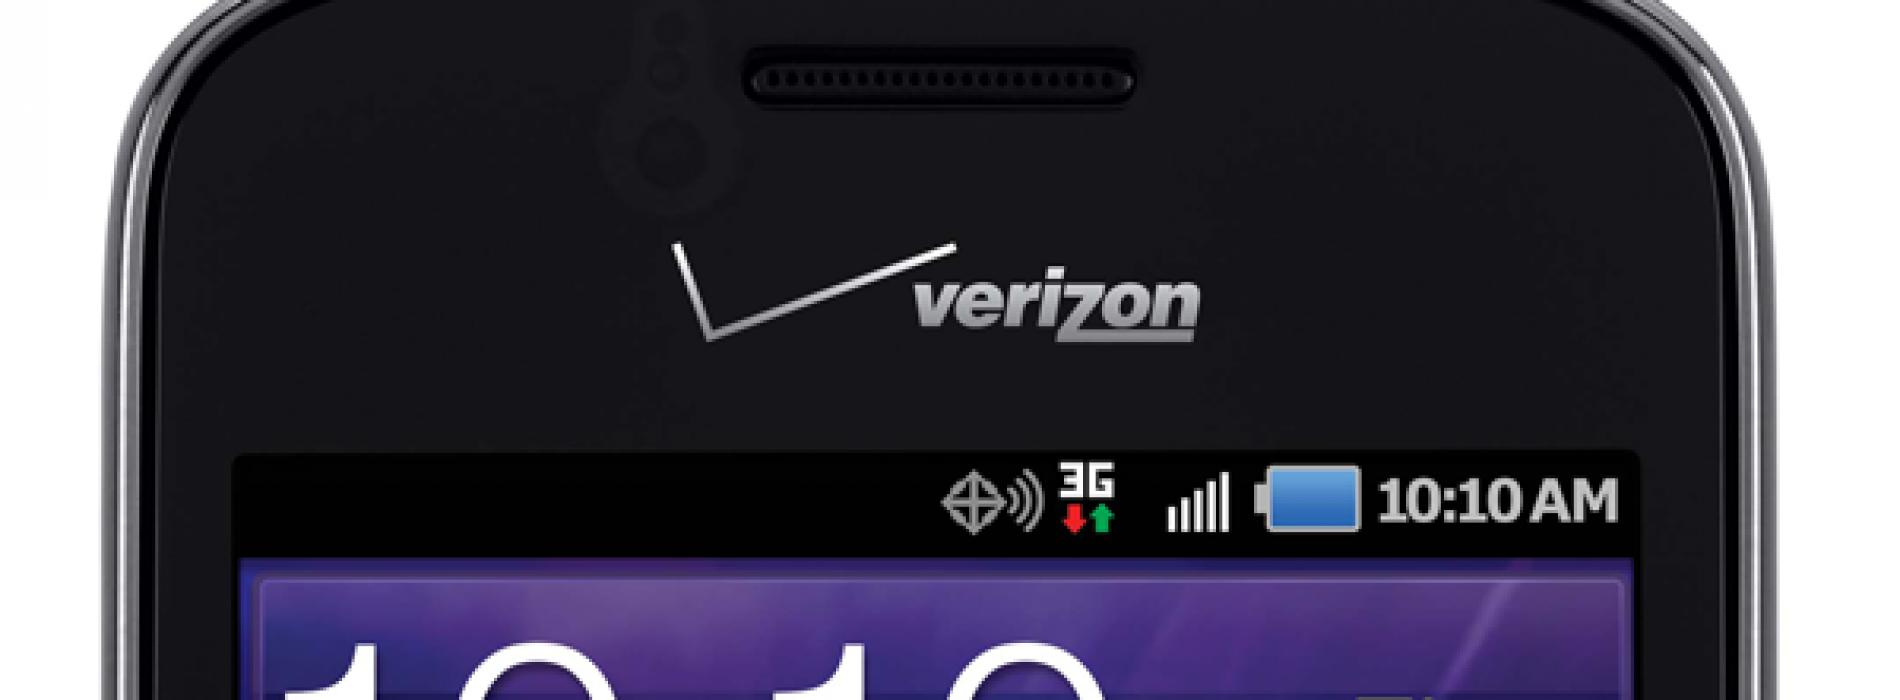 Verizon announces $79.99 Samsung Illusion for November 23